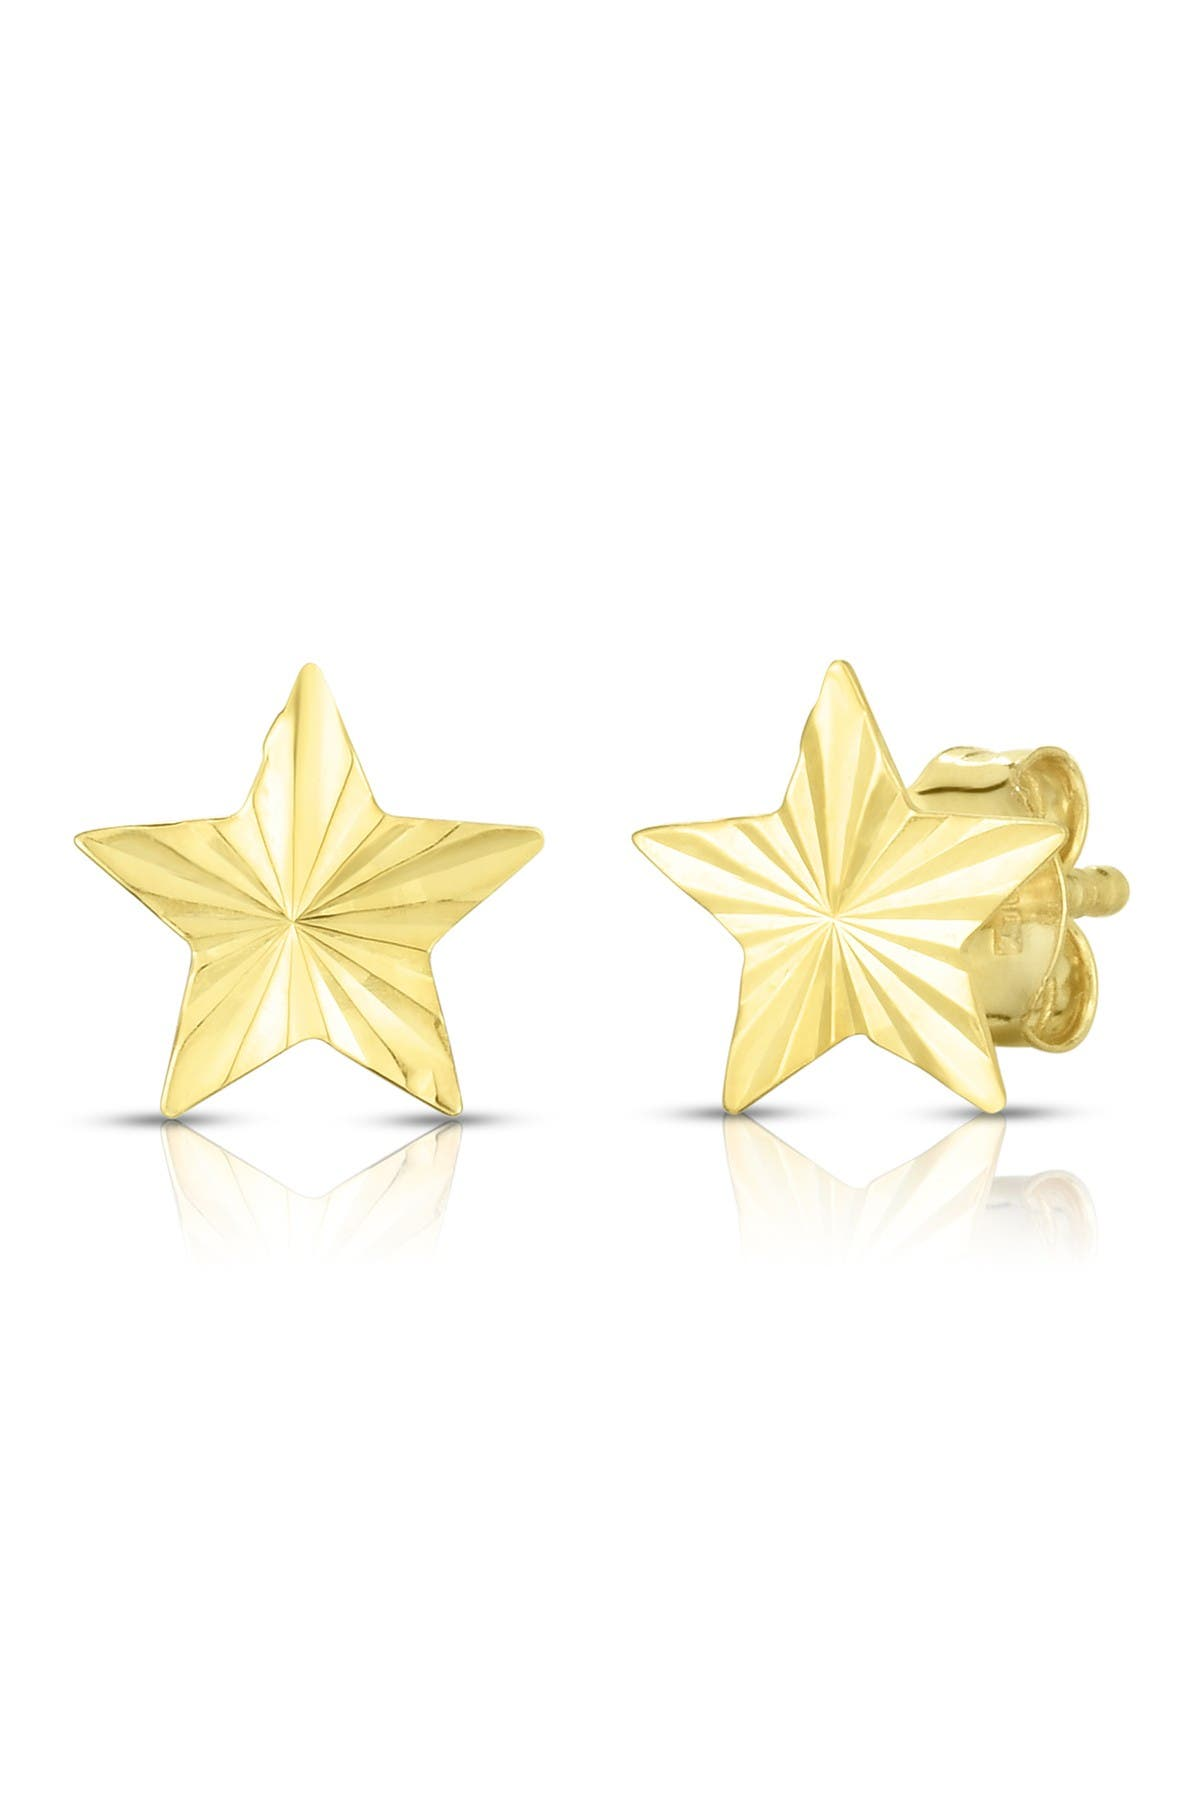 Image of Sphera Milano 14K Yellow Gold Diamond Cut Star Stud Earrings